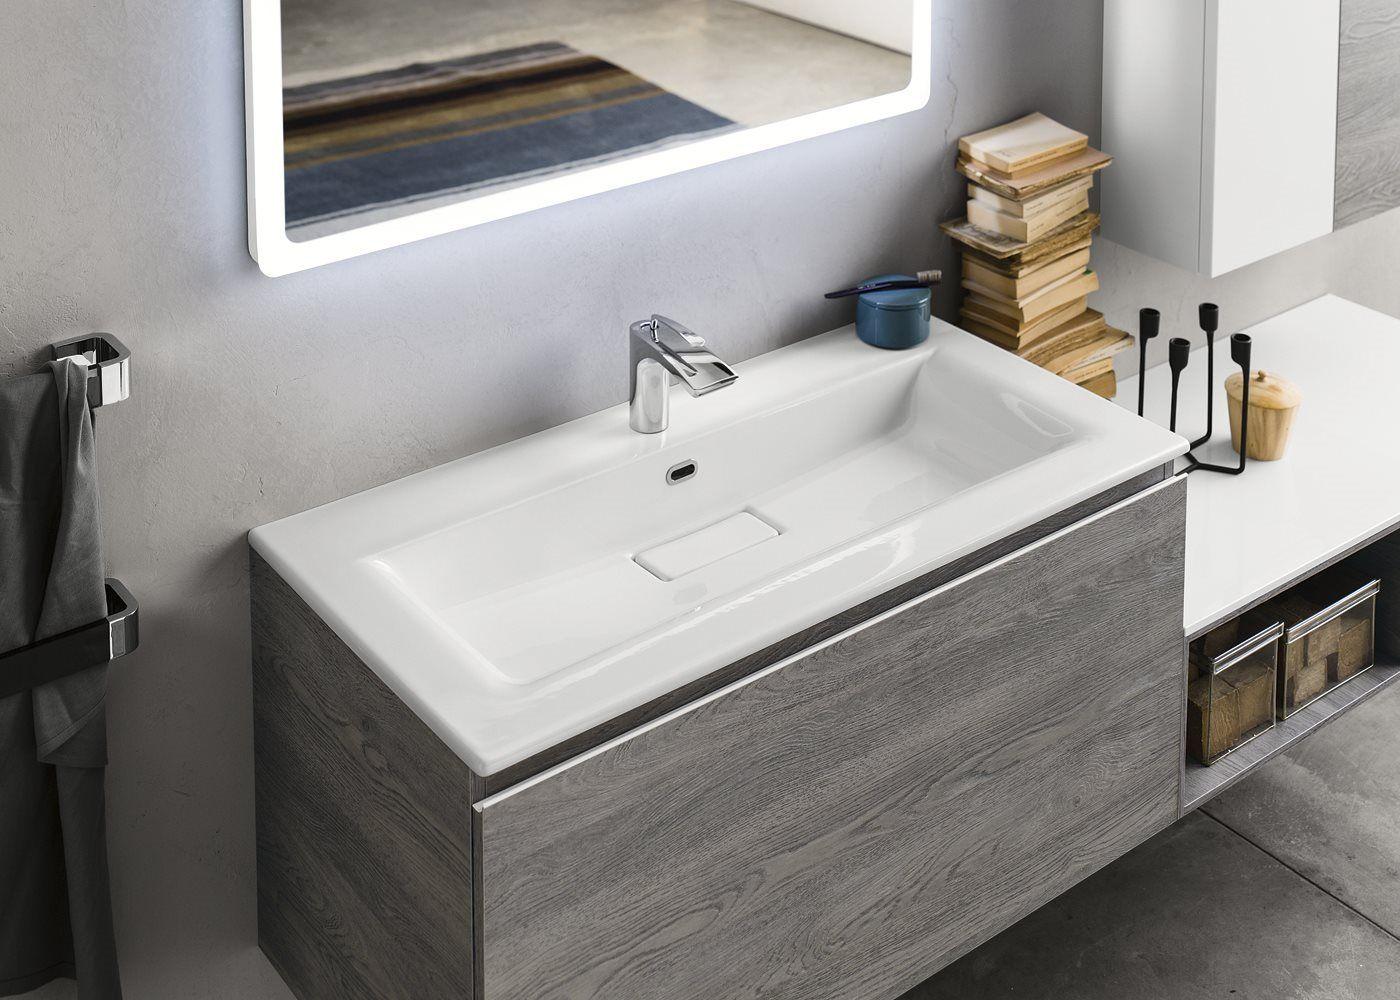 vasque salle de bain encastrable. Black Bedroom Furniture Sets. Home Design Ideas